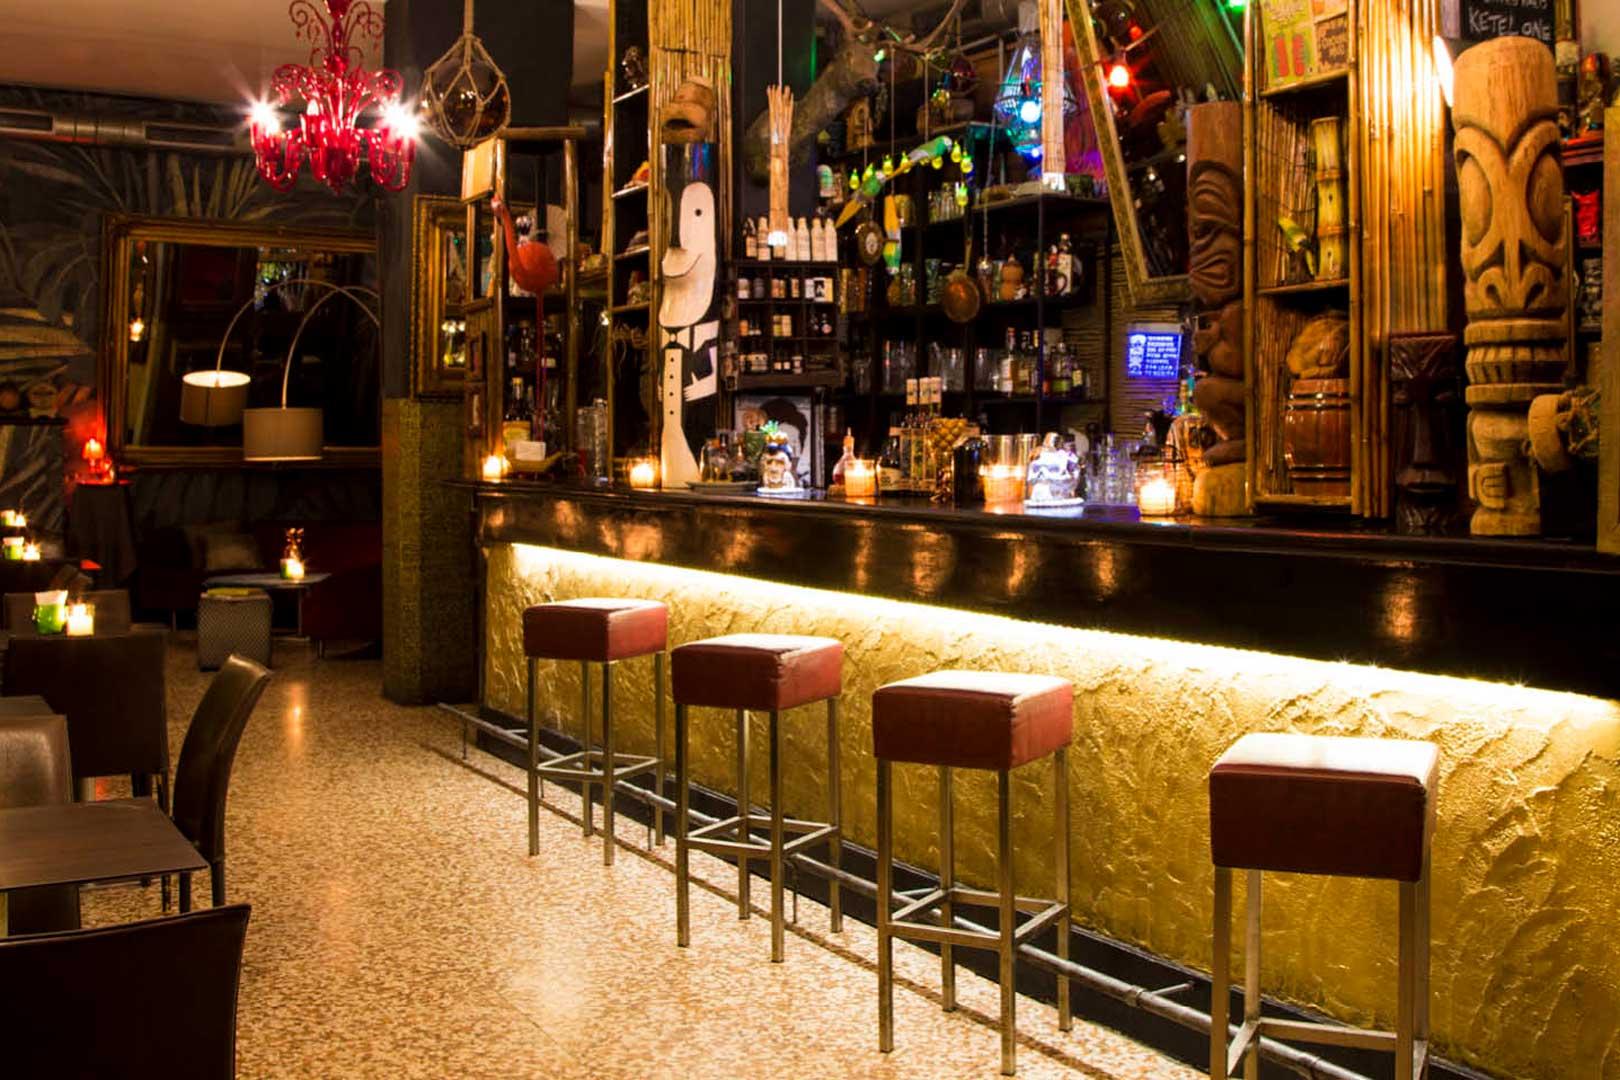 I 10 migliori cocktail bar d'Italia - Nu Lounge Bar